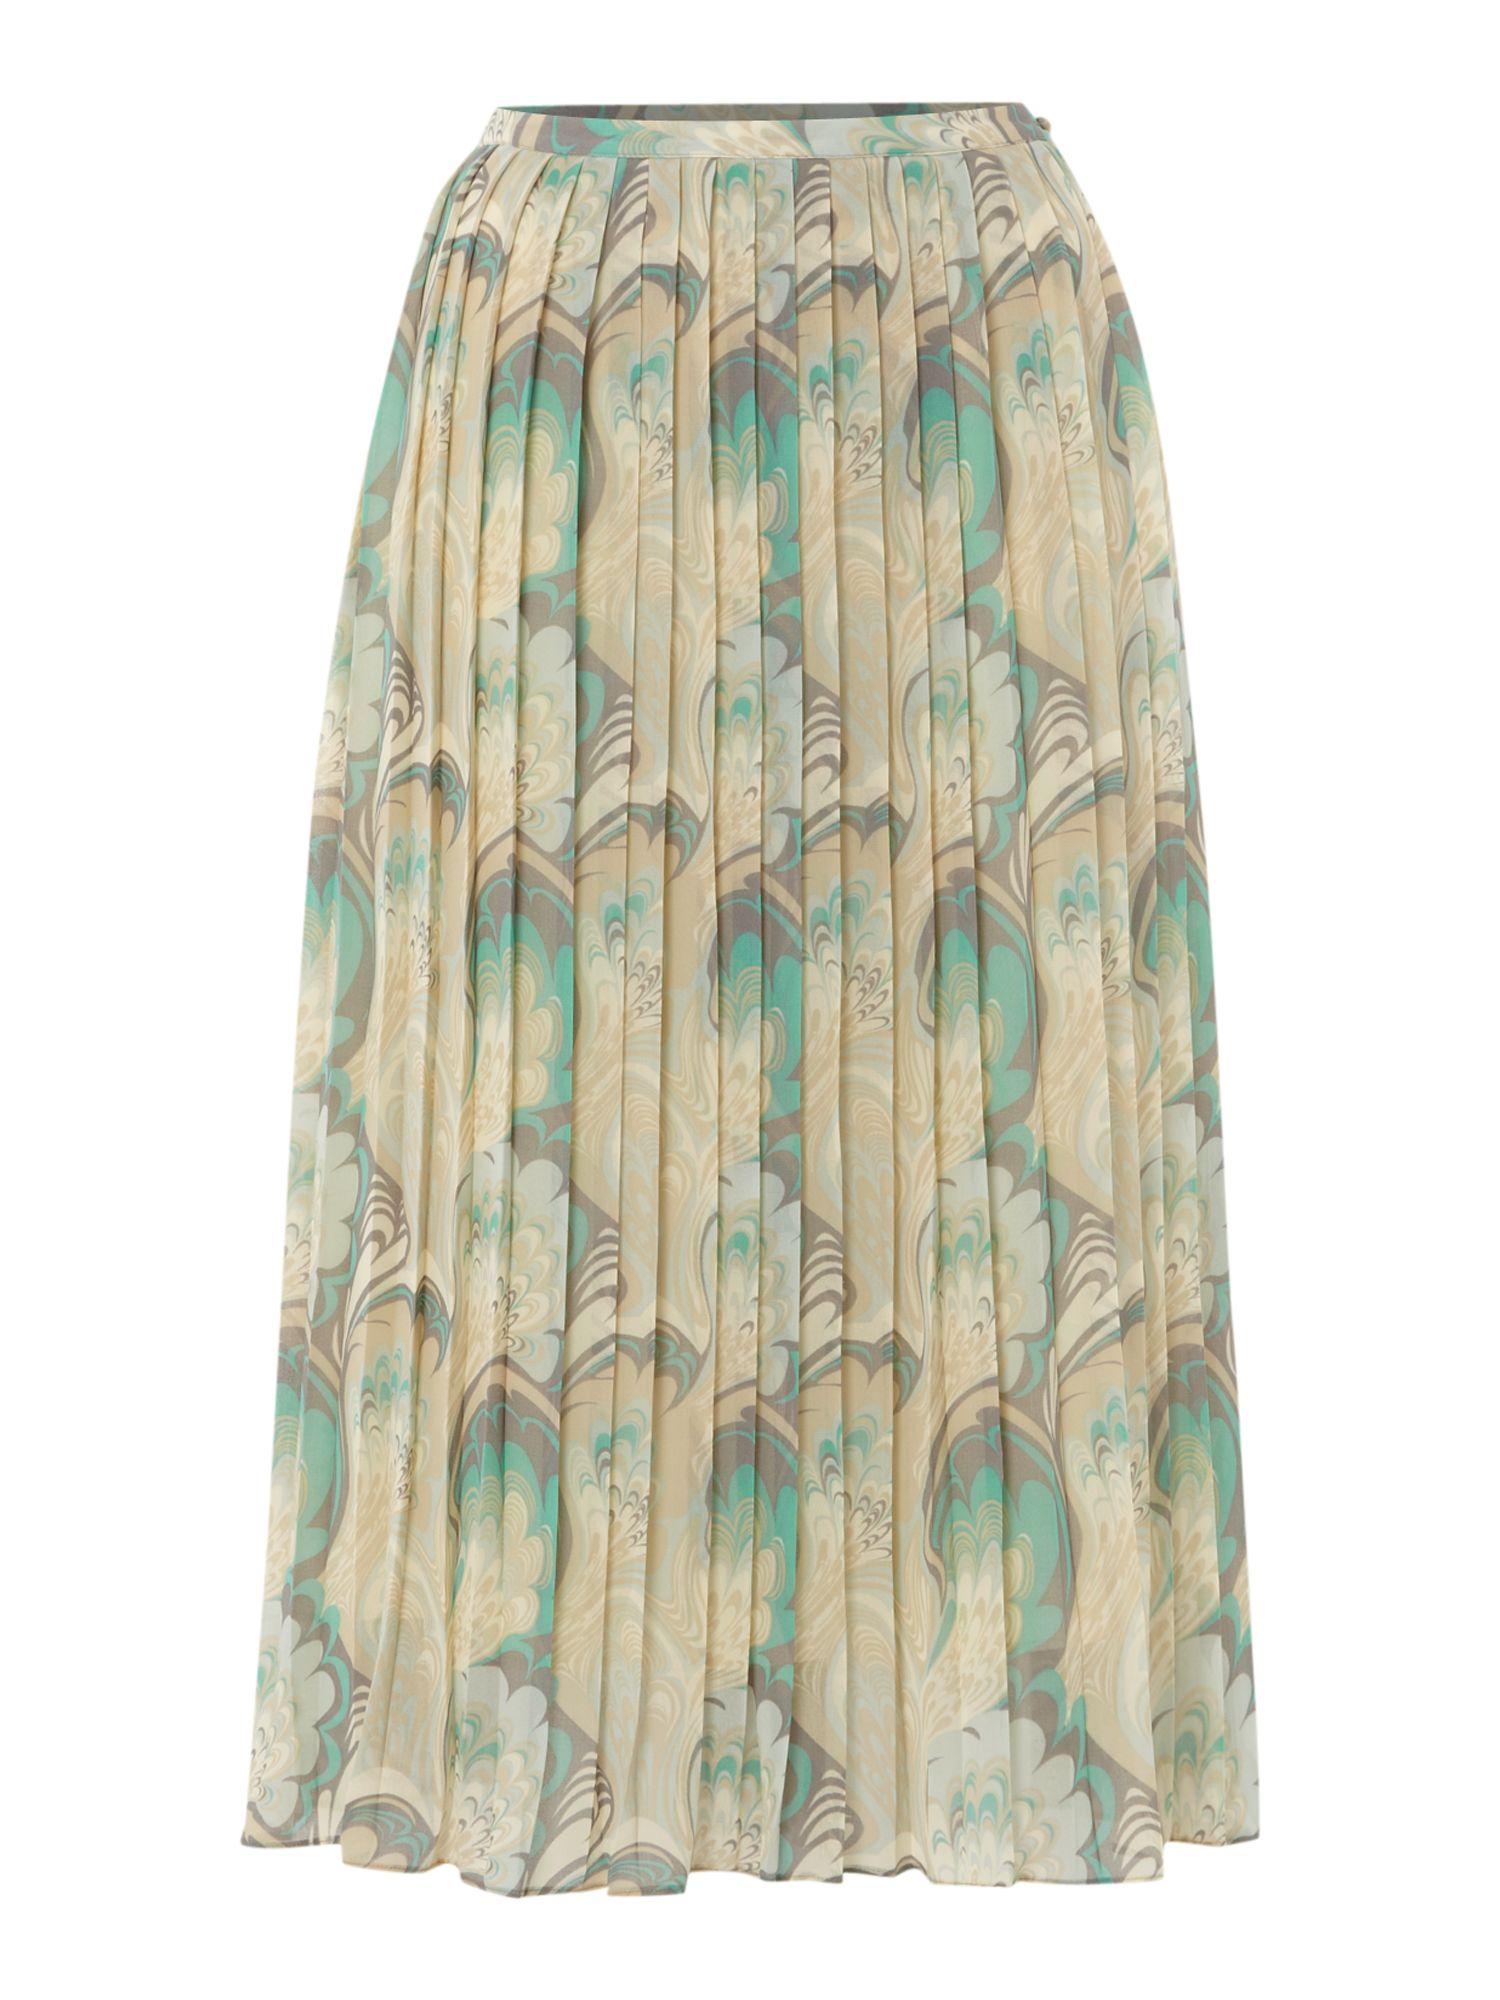 biba feather printed pleated midi skirt in gray multi